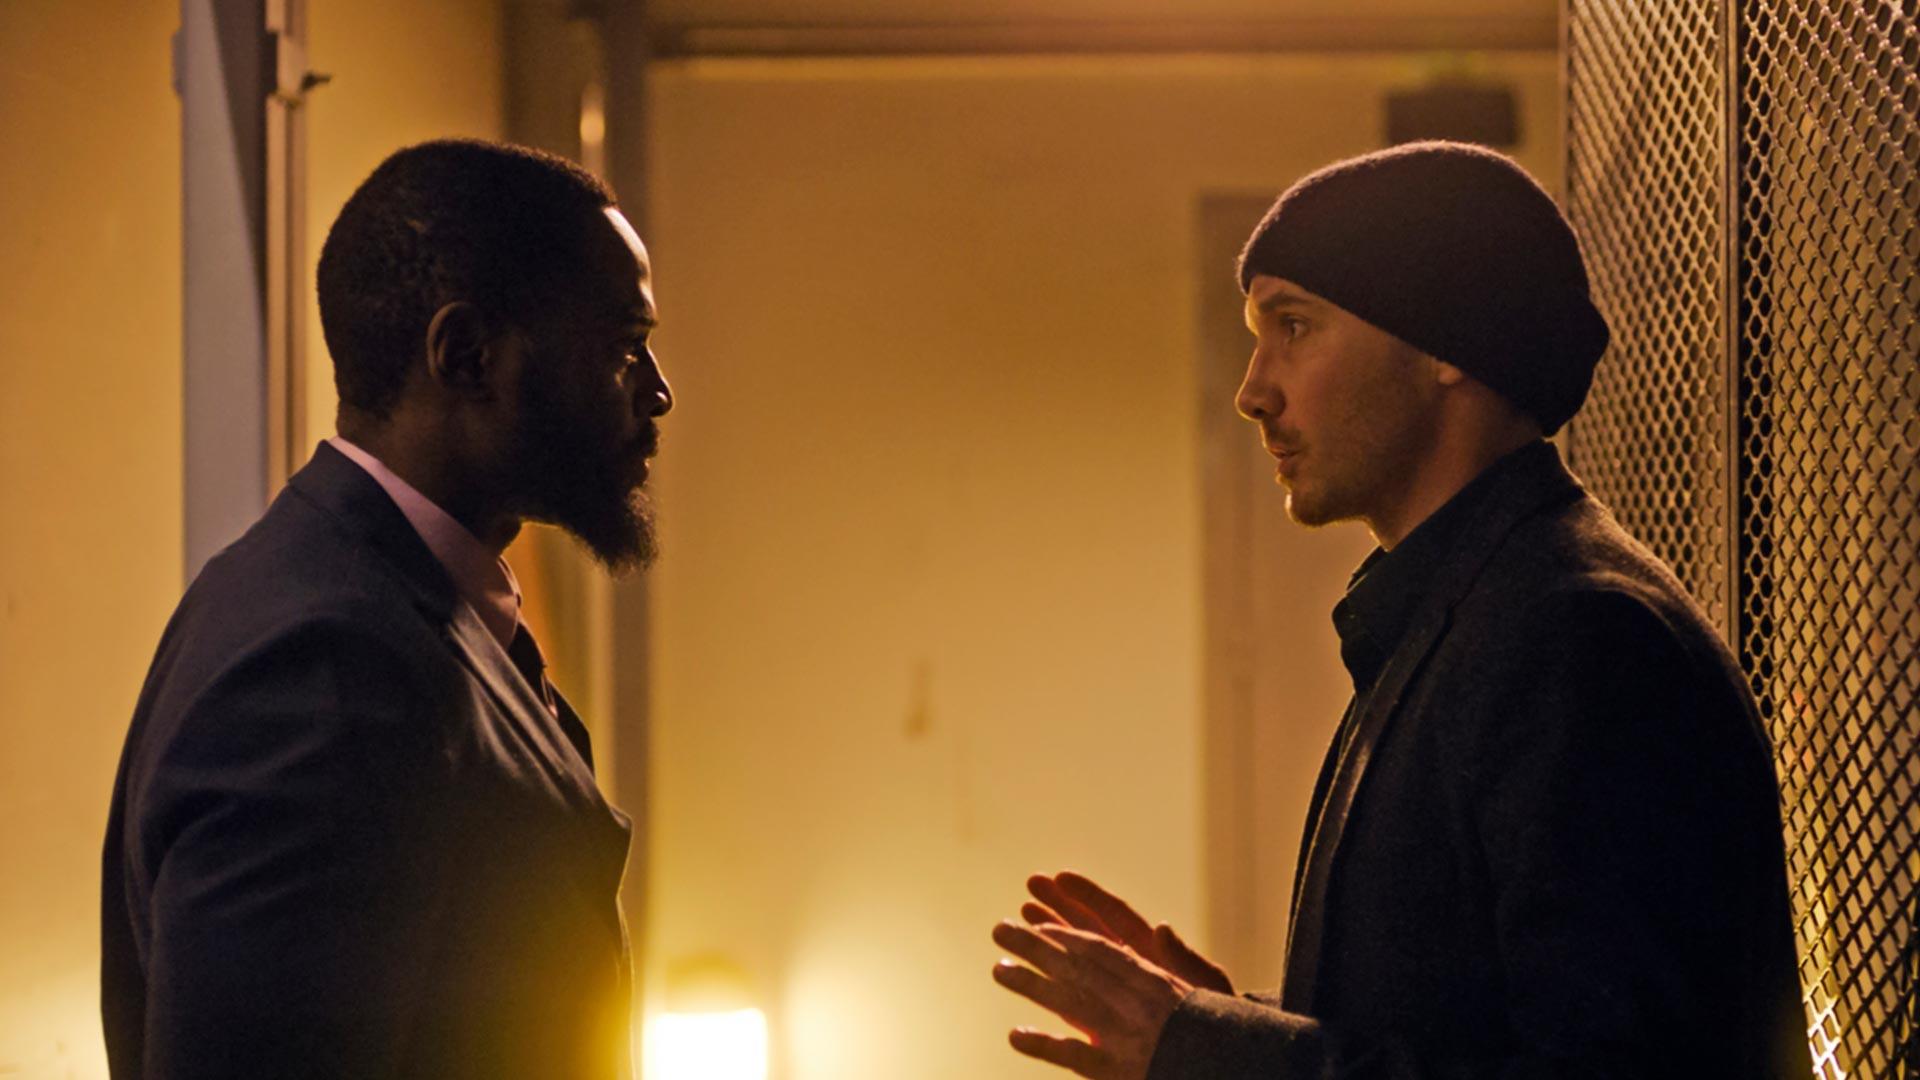 David Nzinga jaSamuli Vauramo elokuvassaKääntöpiste.